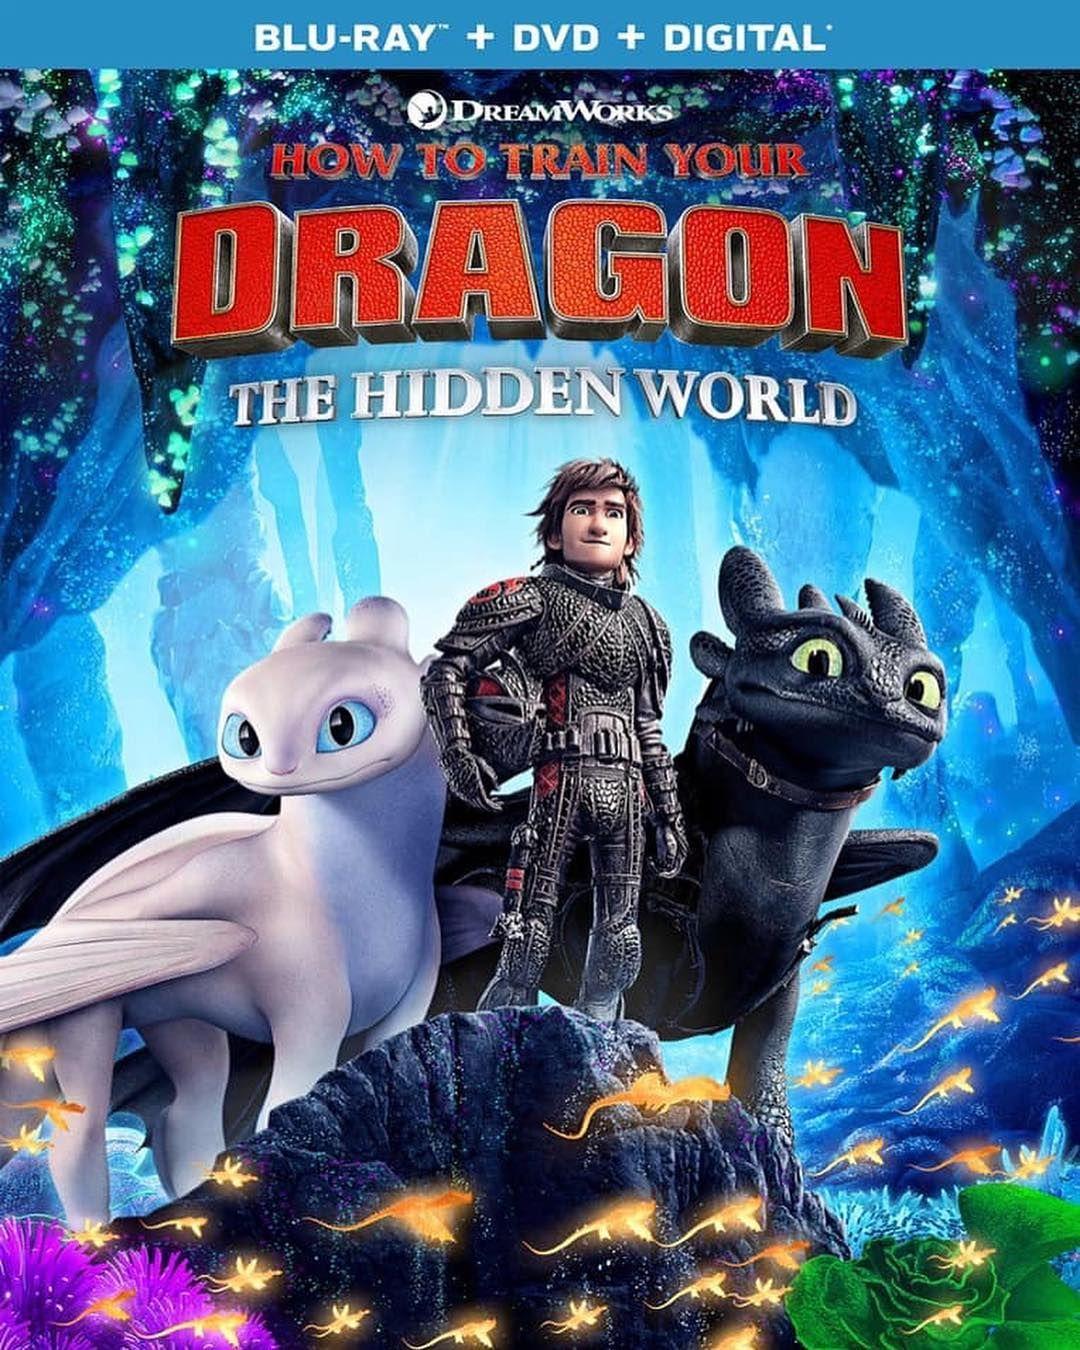 Telecharger How To Train Your Dragon The Hidden World Film En Entier Streaming Vf Regar How Train Your Dragon How To Train Your Dragon How To Train Dragon